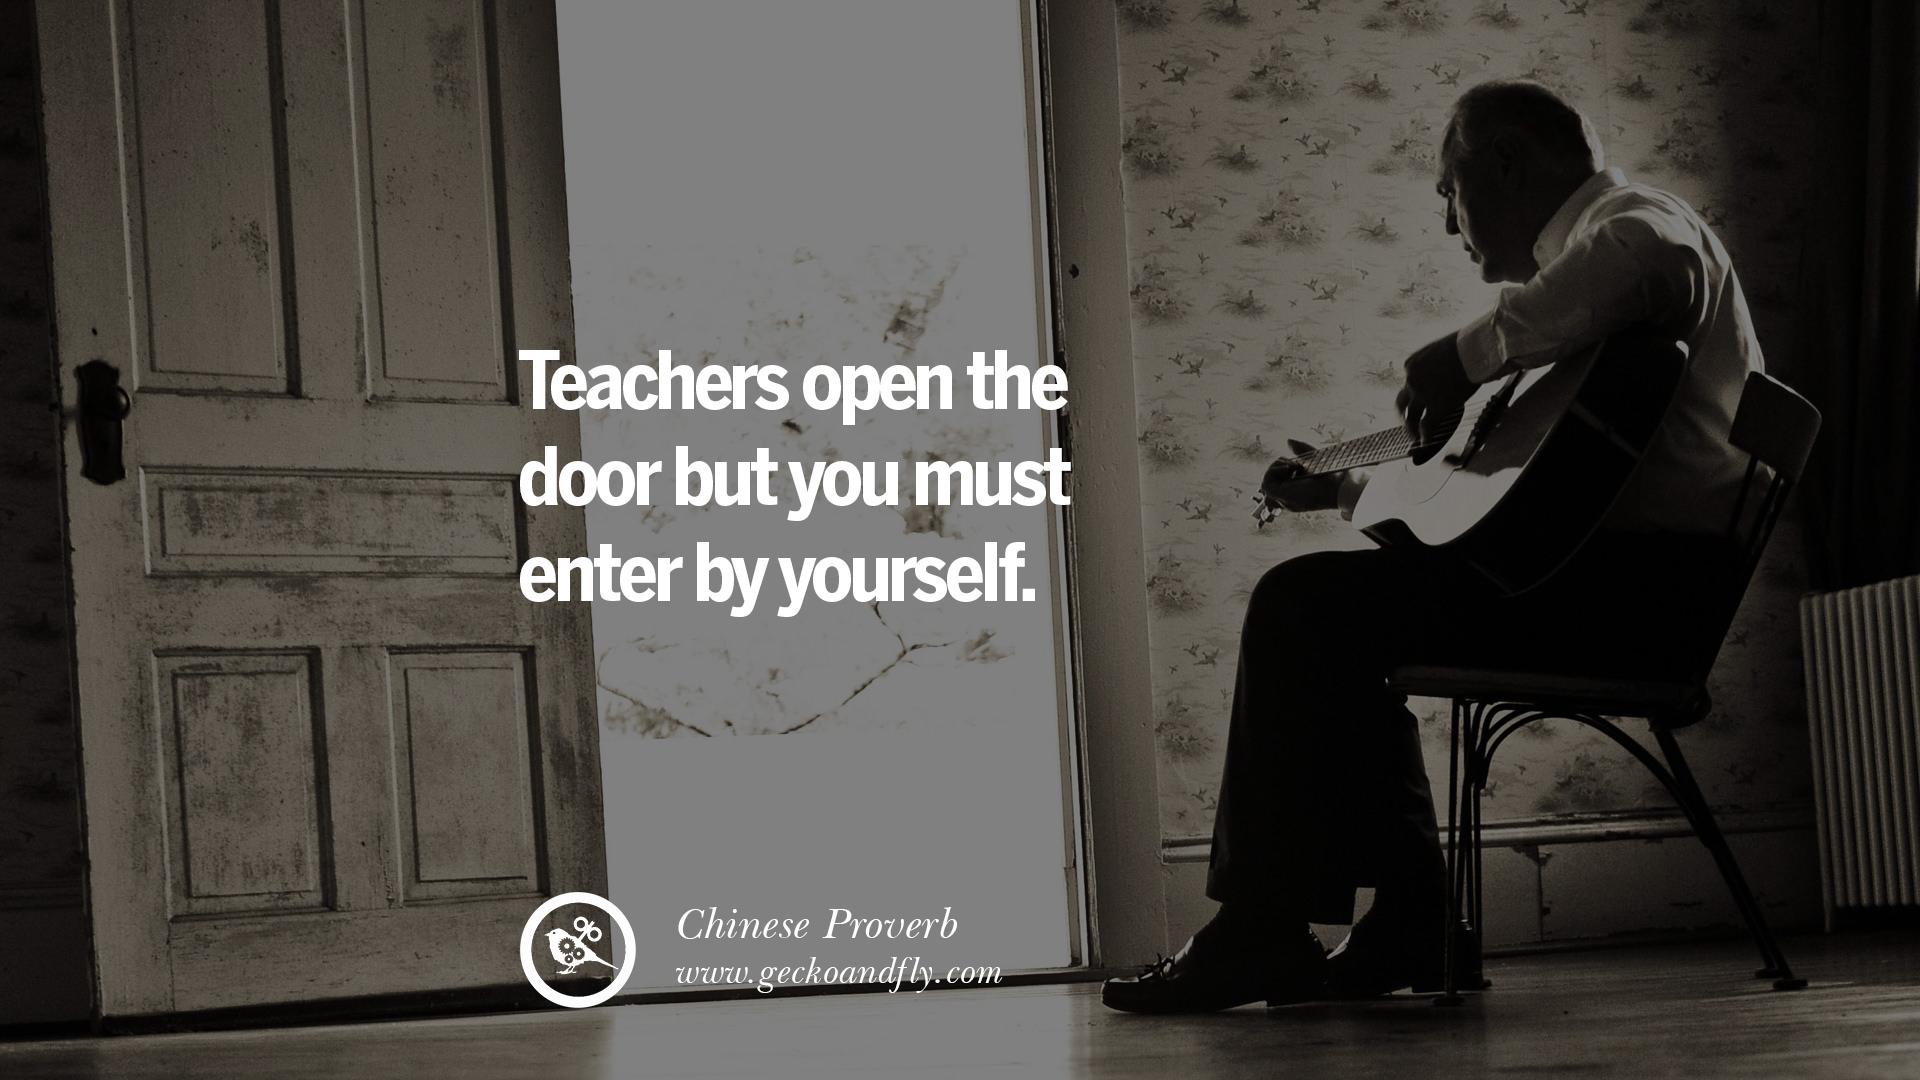 Teachers open the door but you enter by yourself essay